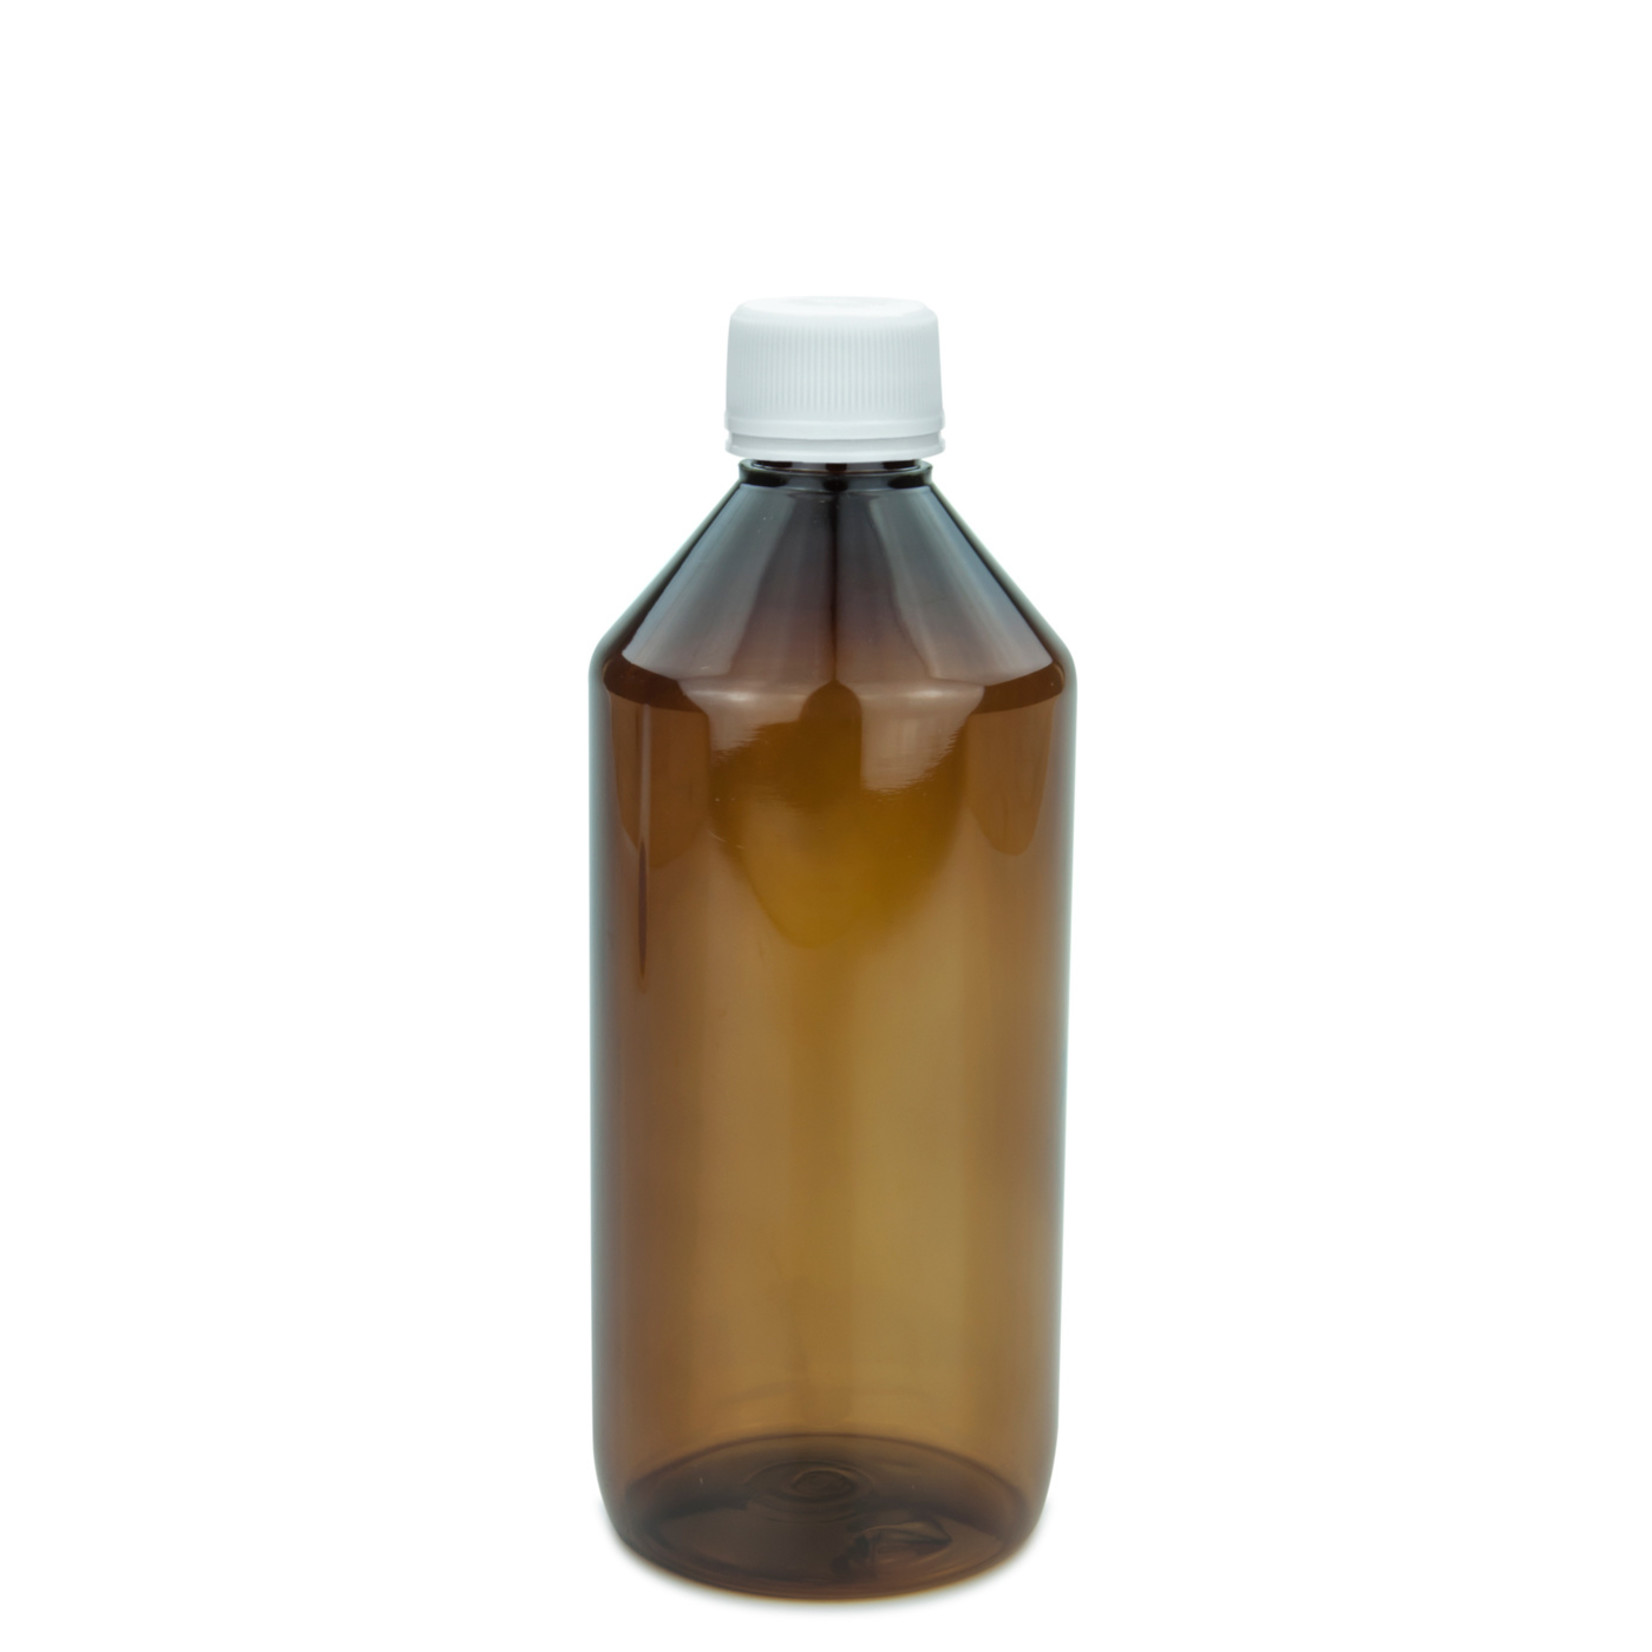 VPG 25/75 Nikotin-Salz Base 3-36 mg/ml 250-1000ml